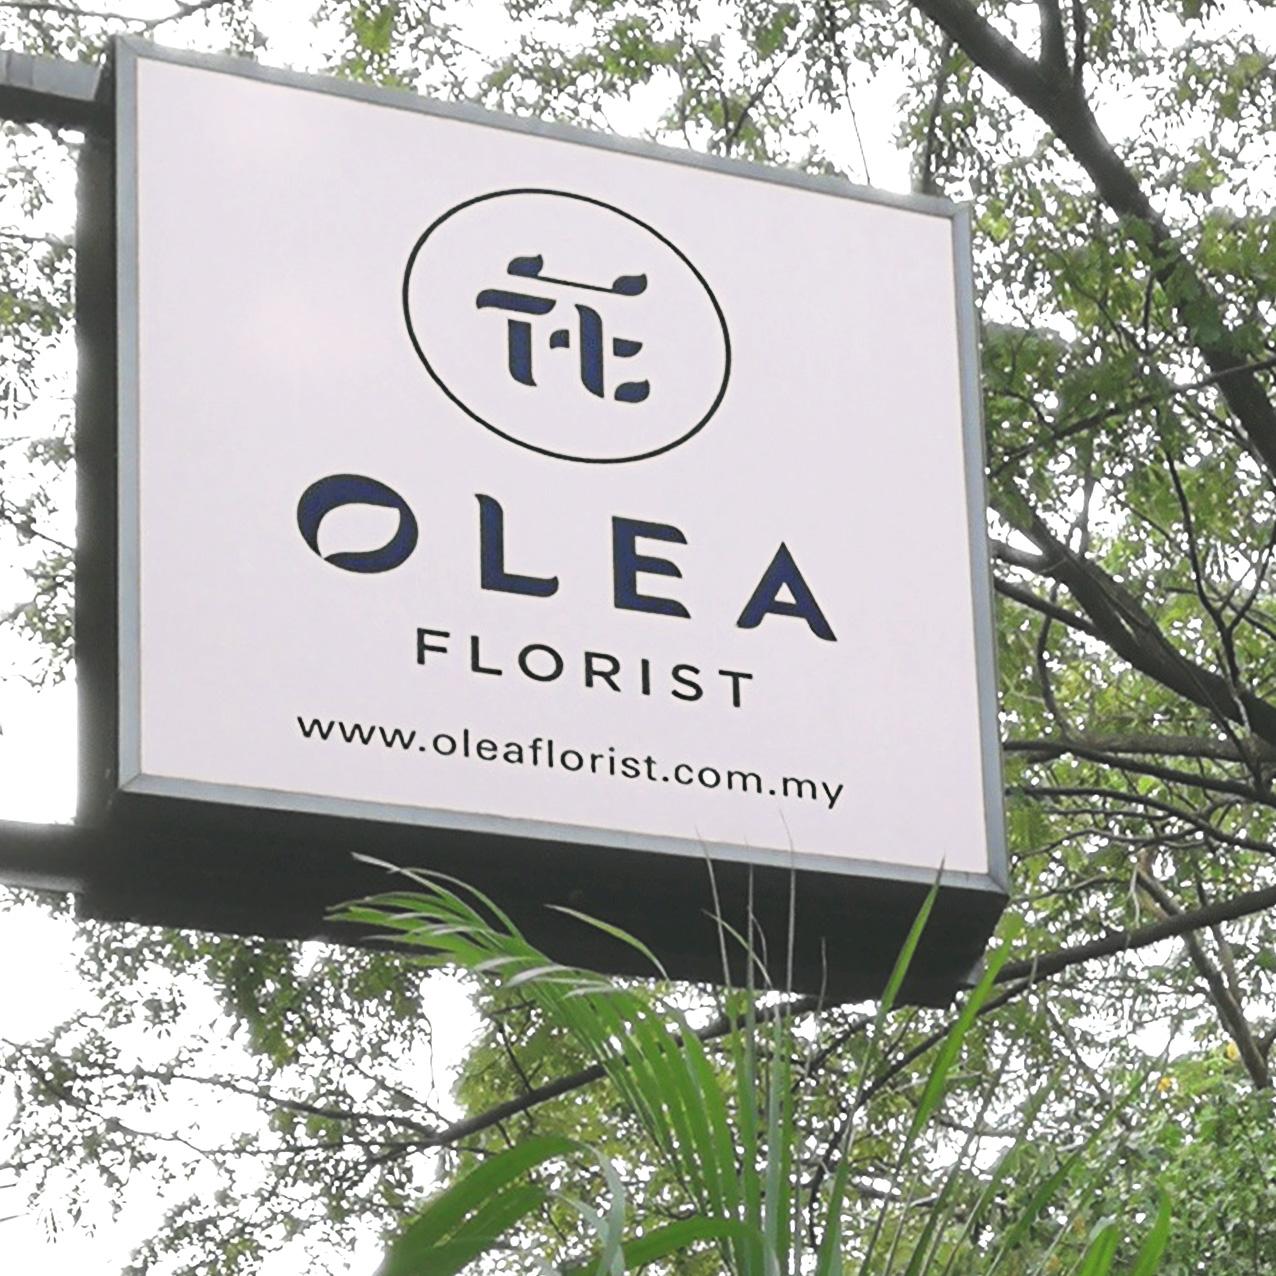 Olea Florist in Taman Desa